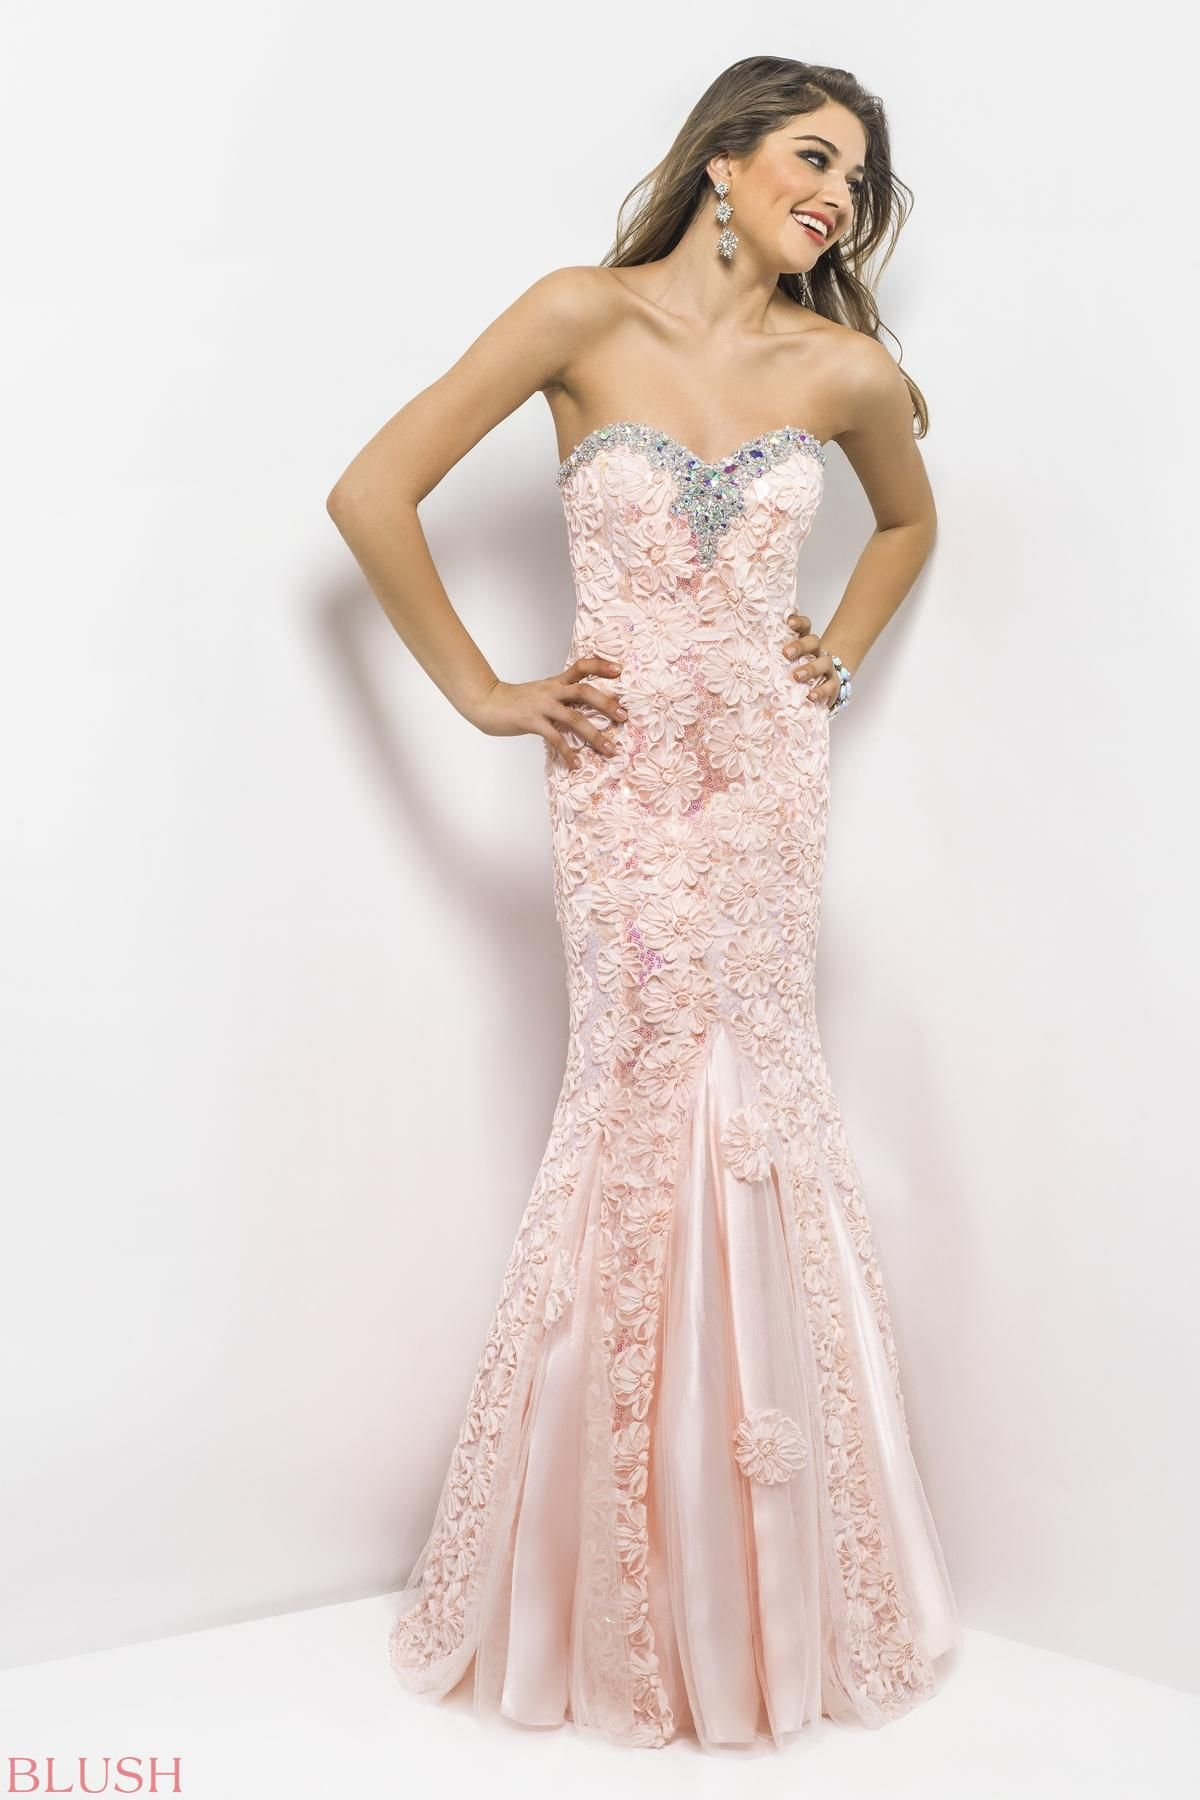 What does elegantly formal dresses means?